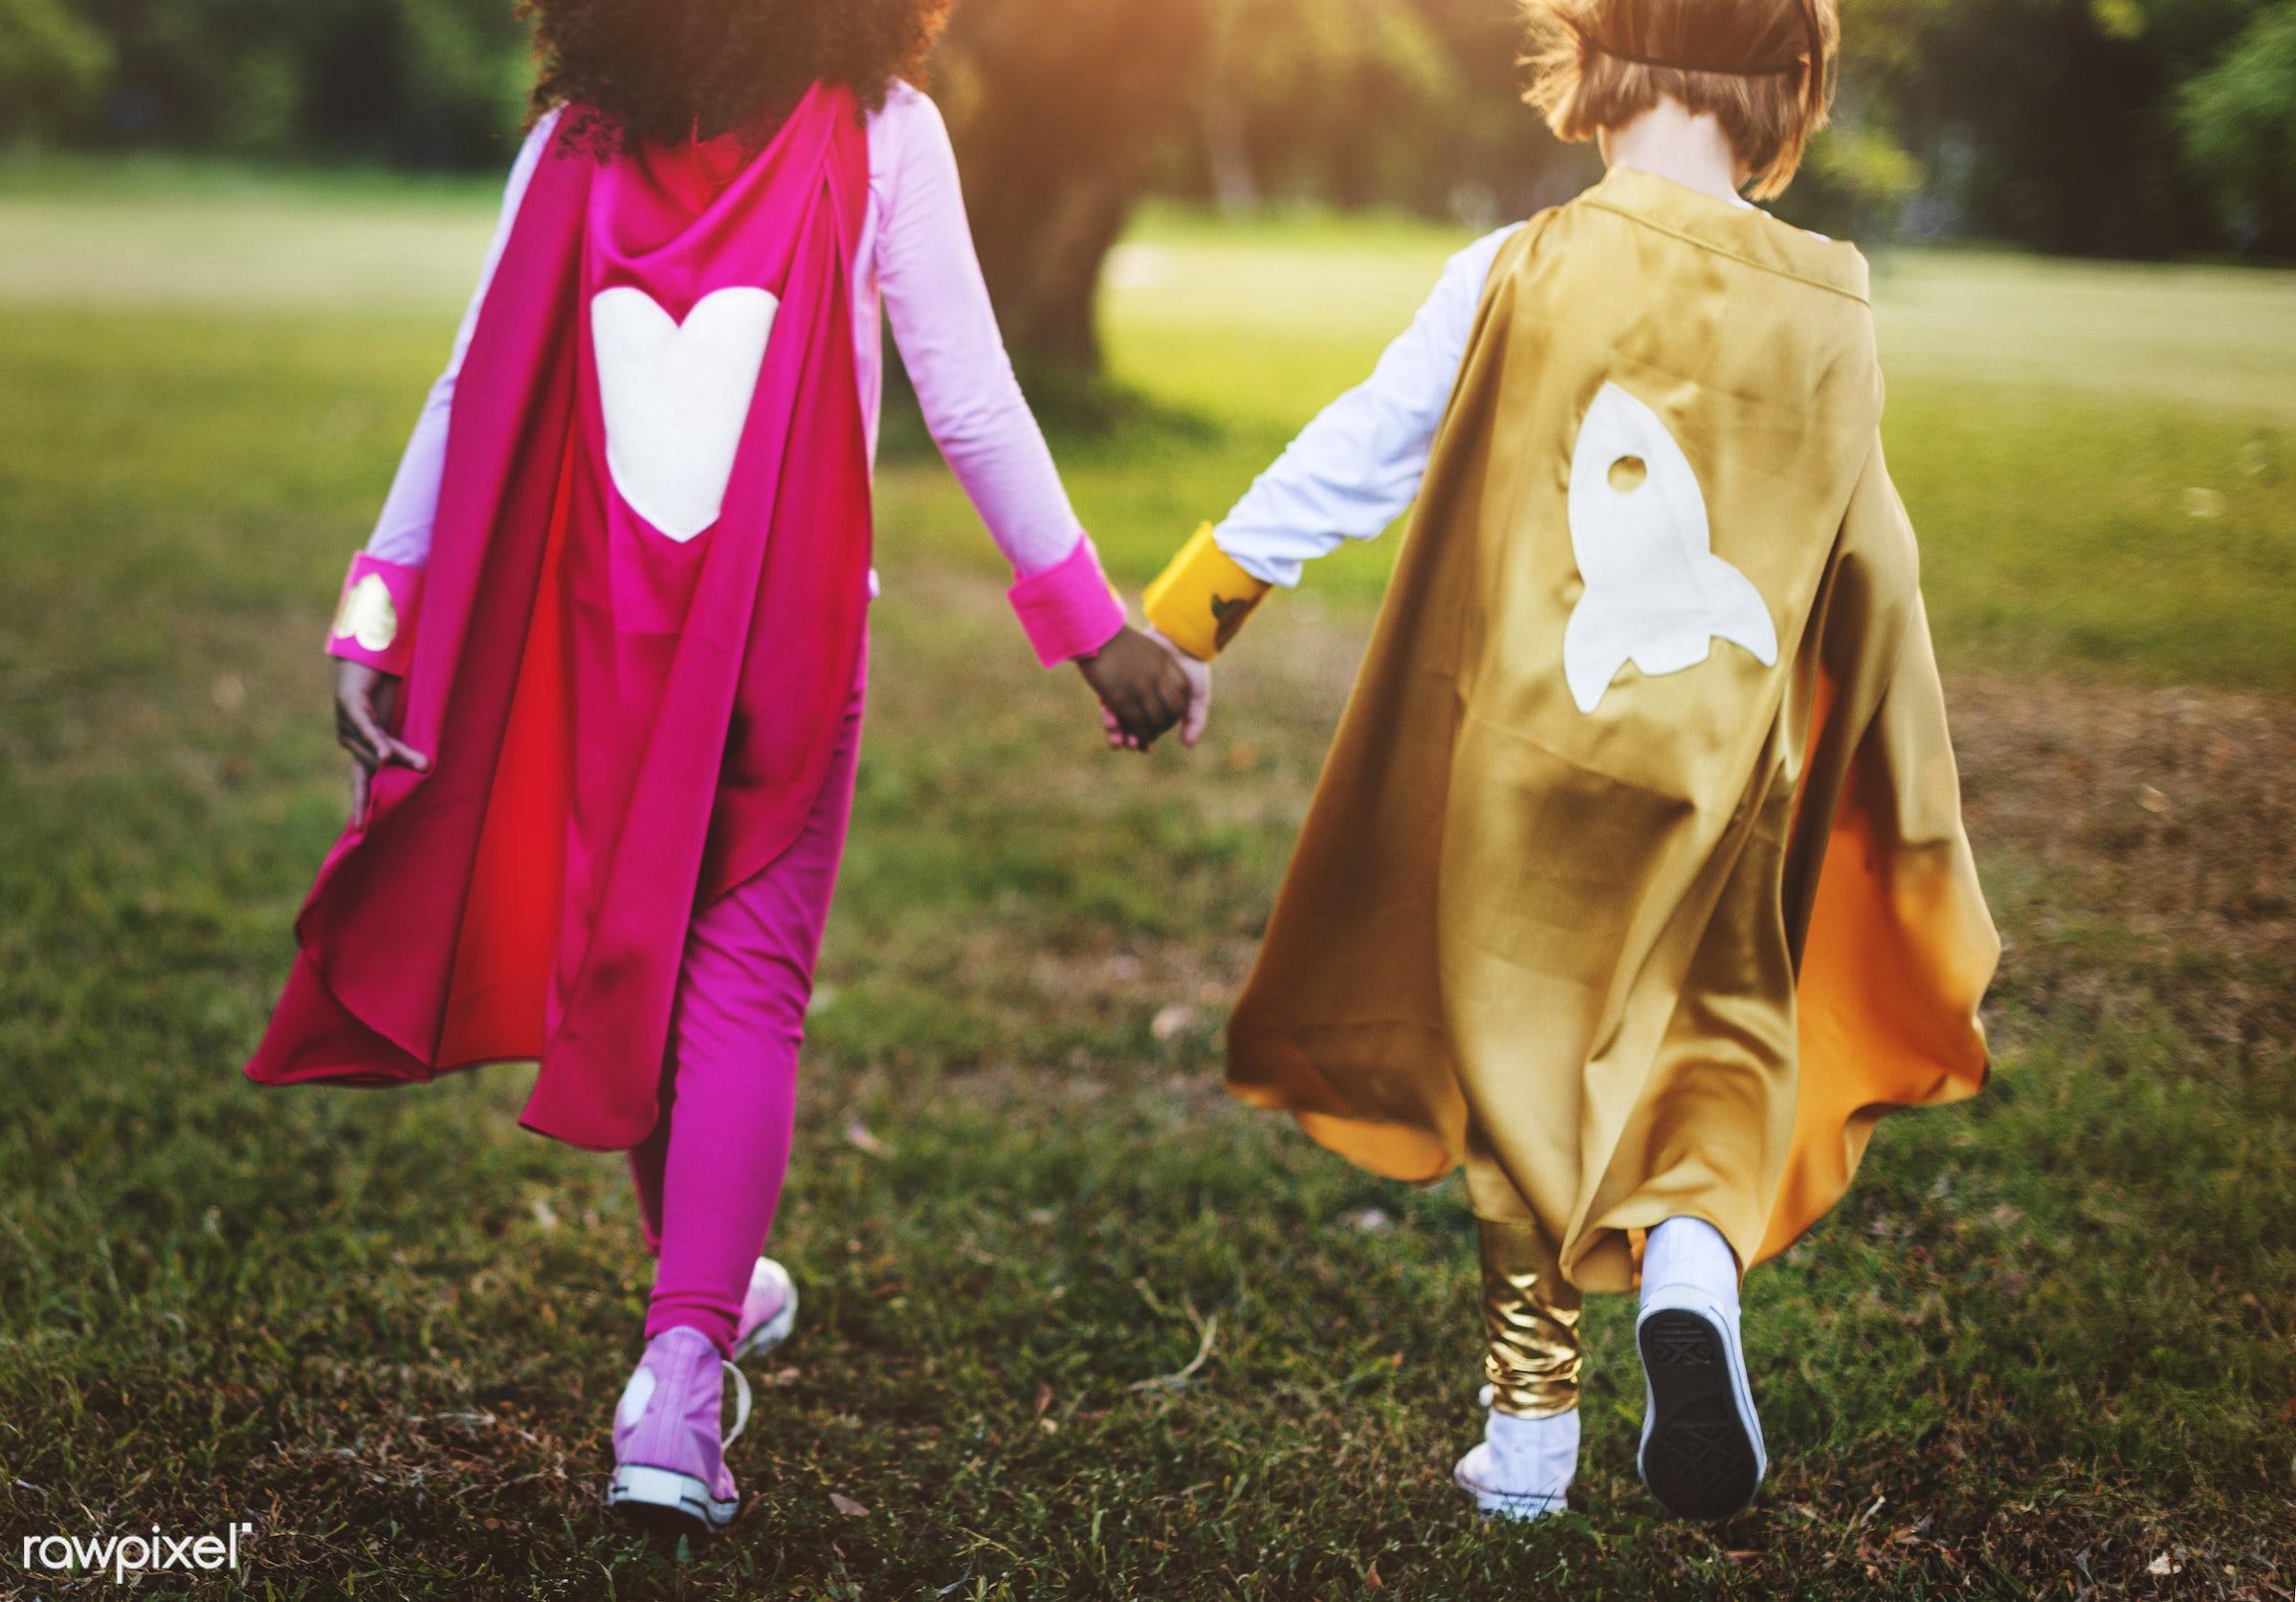 Superhero kids with superpowers - superhero, adorable, aspiration, boys, cape, cheerful, child, childhood, children,...